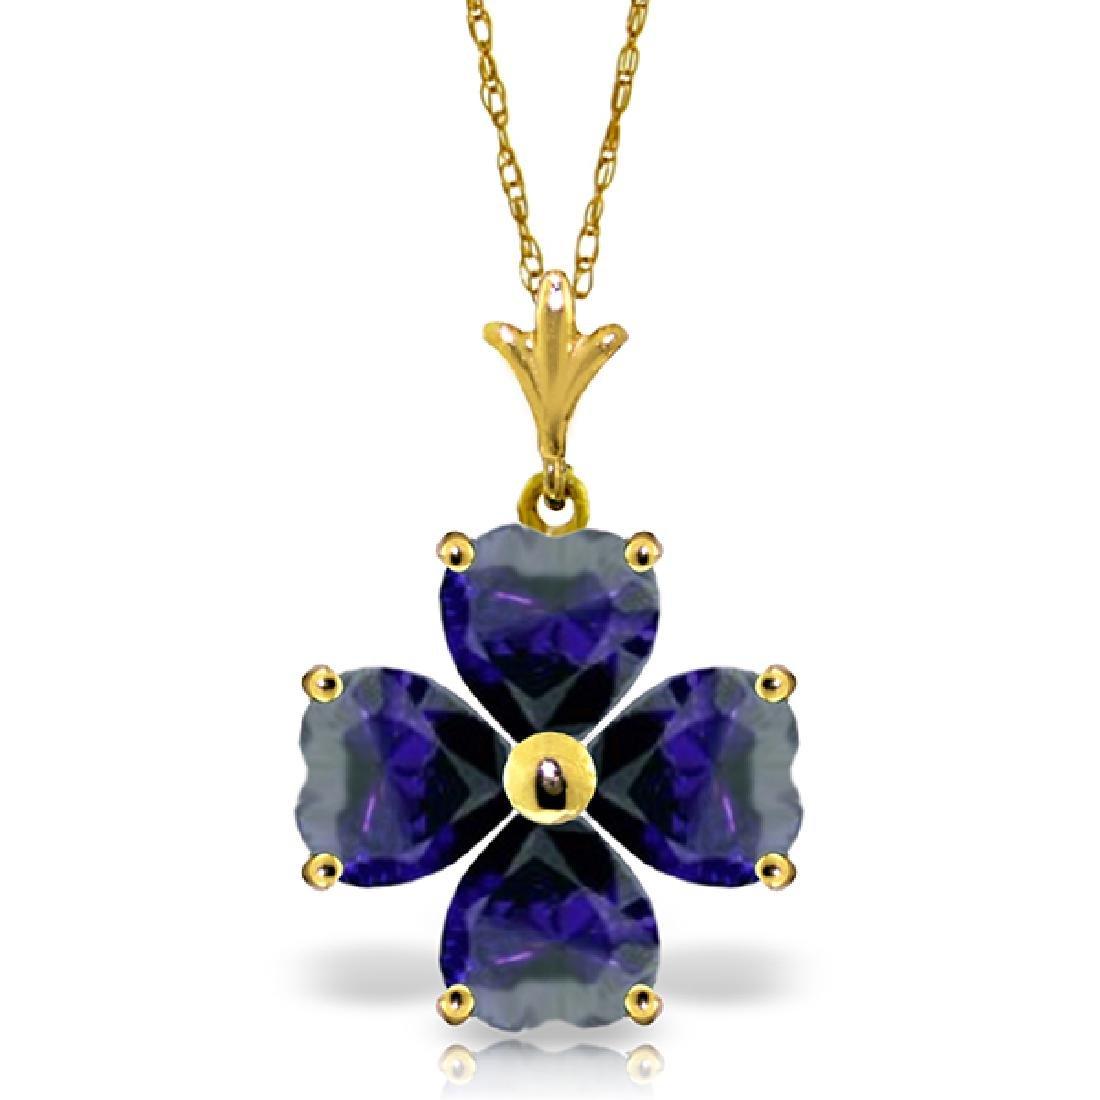 Genuine 3.6 ctw Sapphire Necklace Jewelry 14KT Yellow